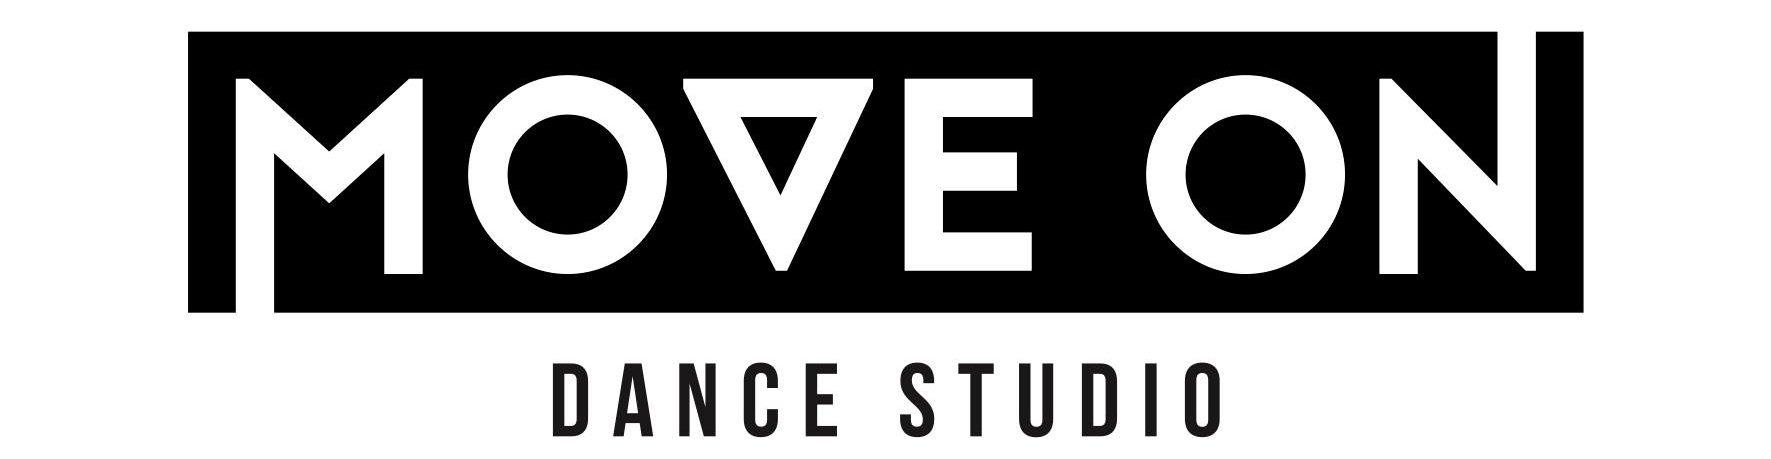 Move On Dance Studio